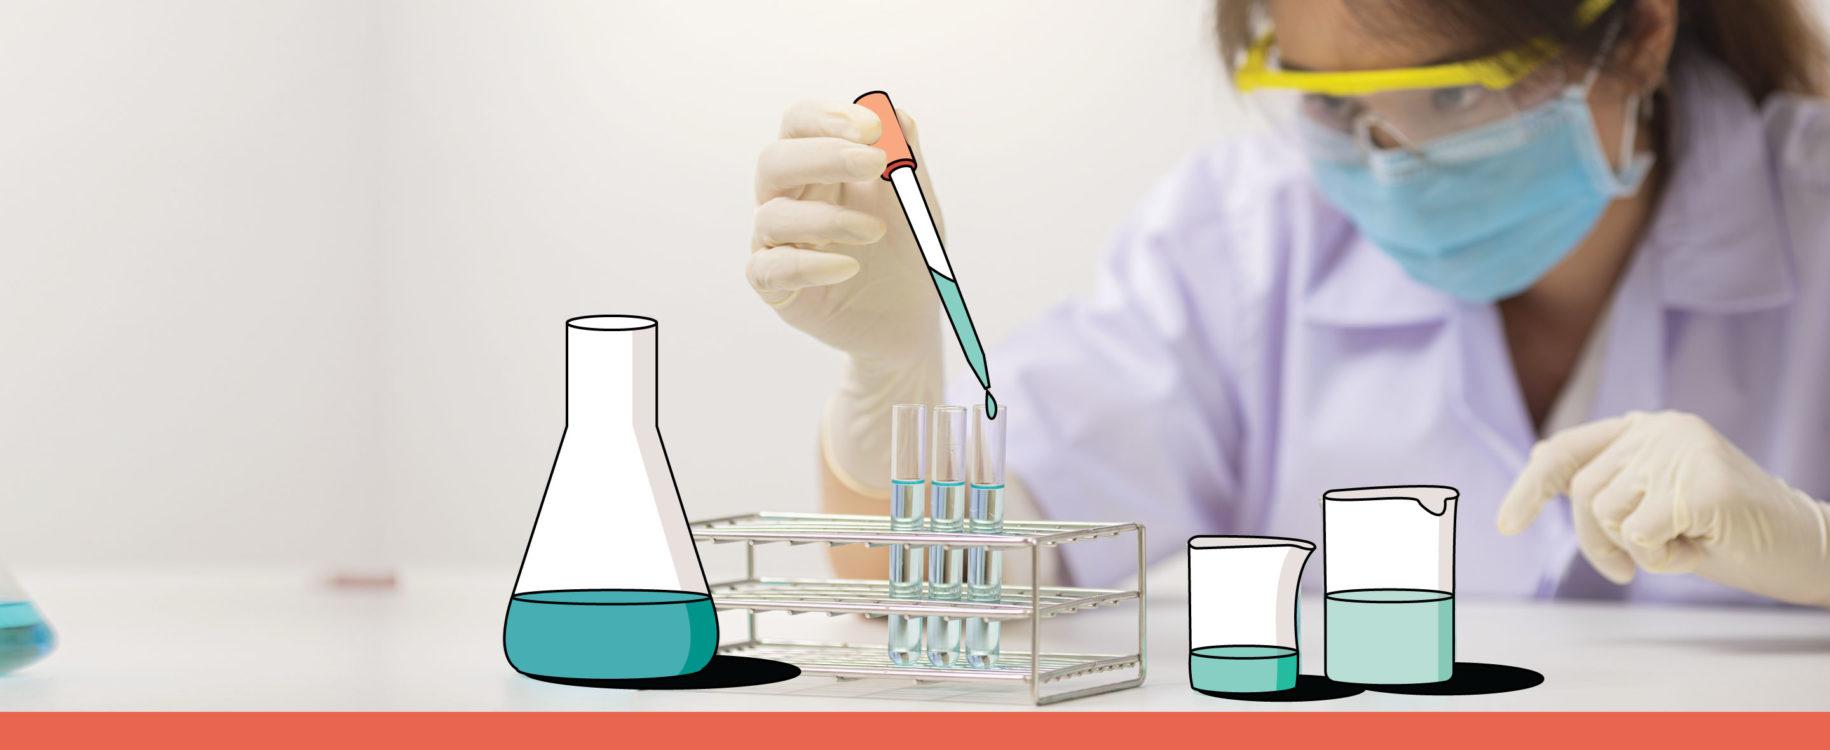 Qu'est-ce que le vaccin contre la COVID-19?